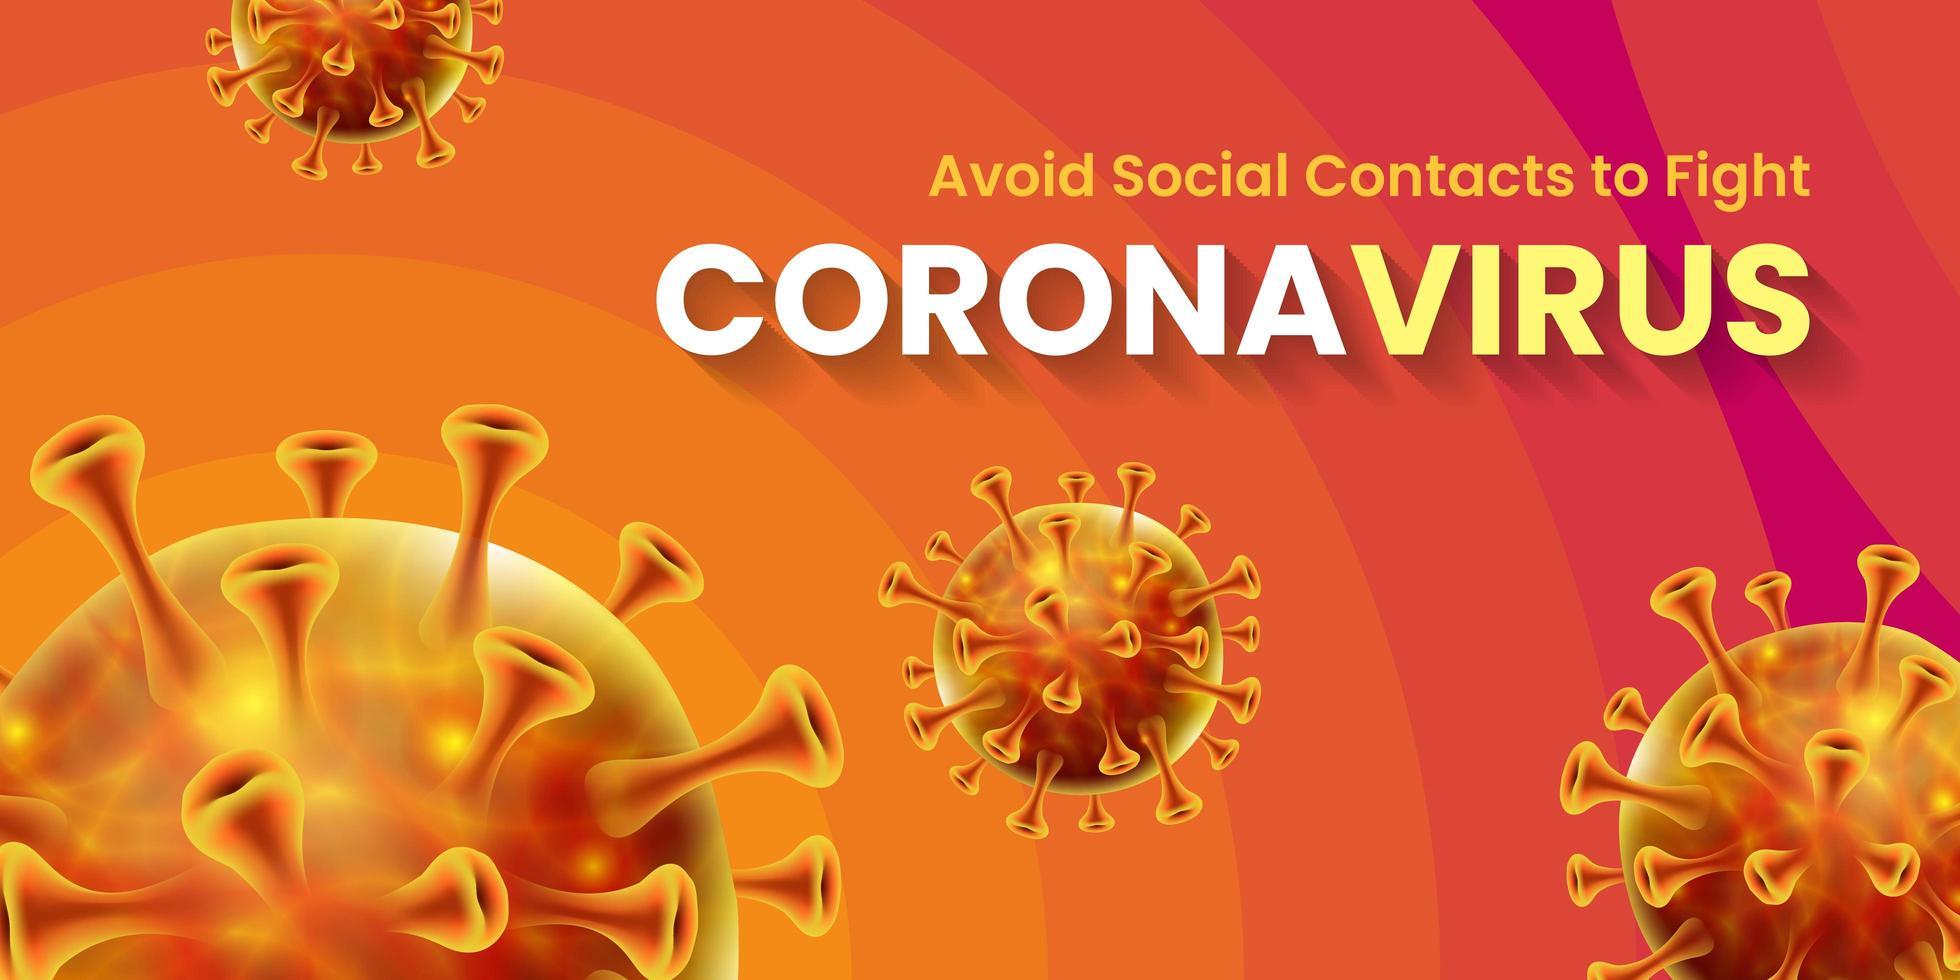 covid-19 corona virus pandemic banner design globale vettore